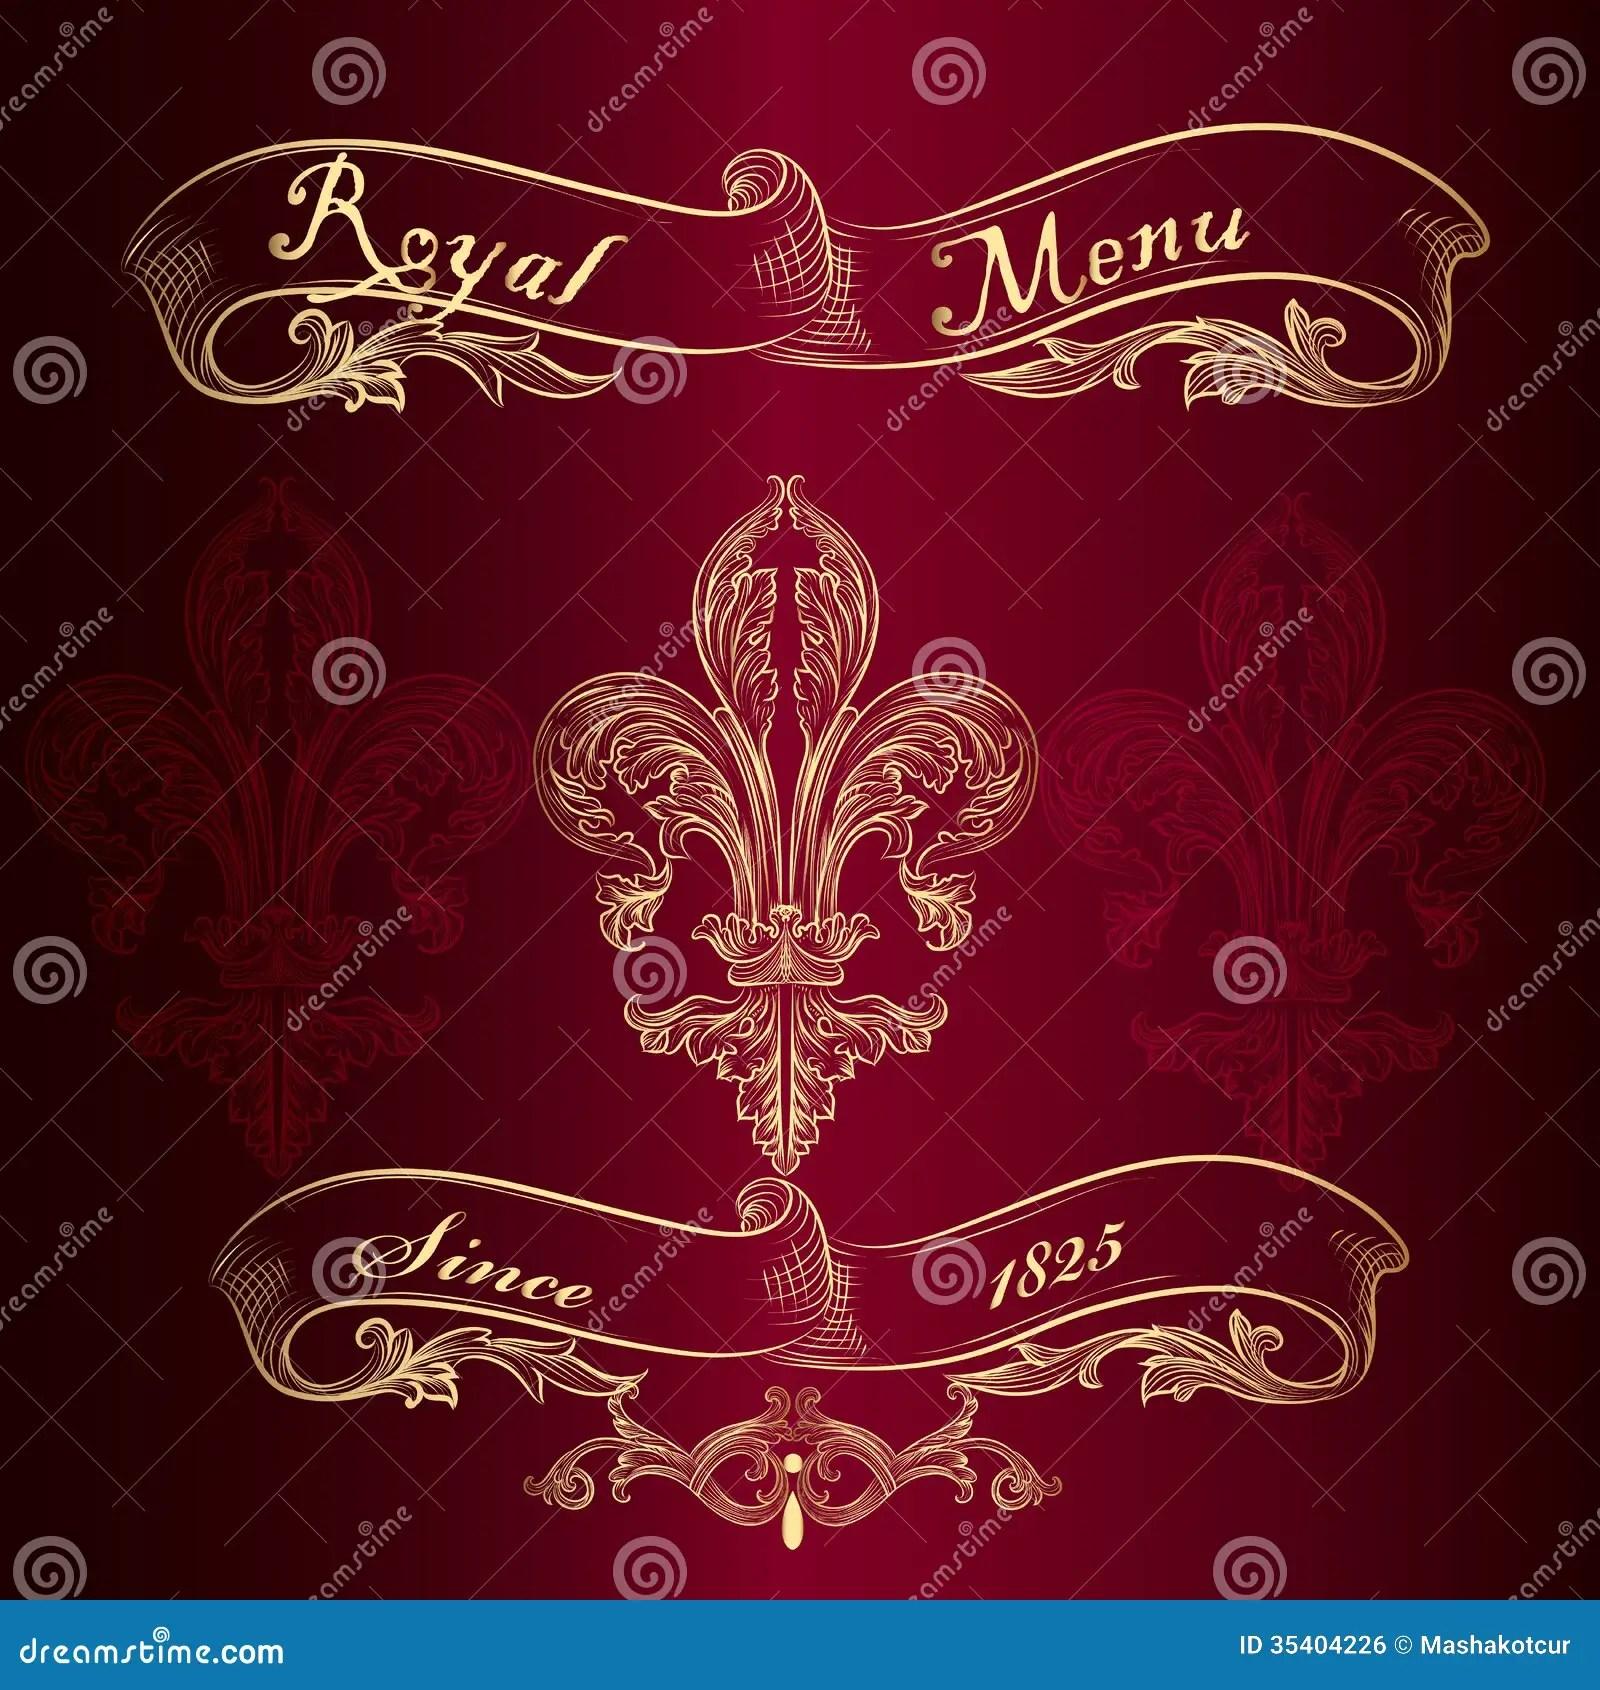 Royal Menu Design With Fleur De Lis Stock Vector Image